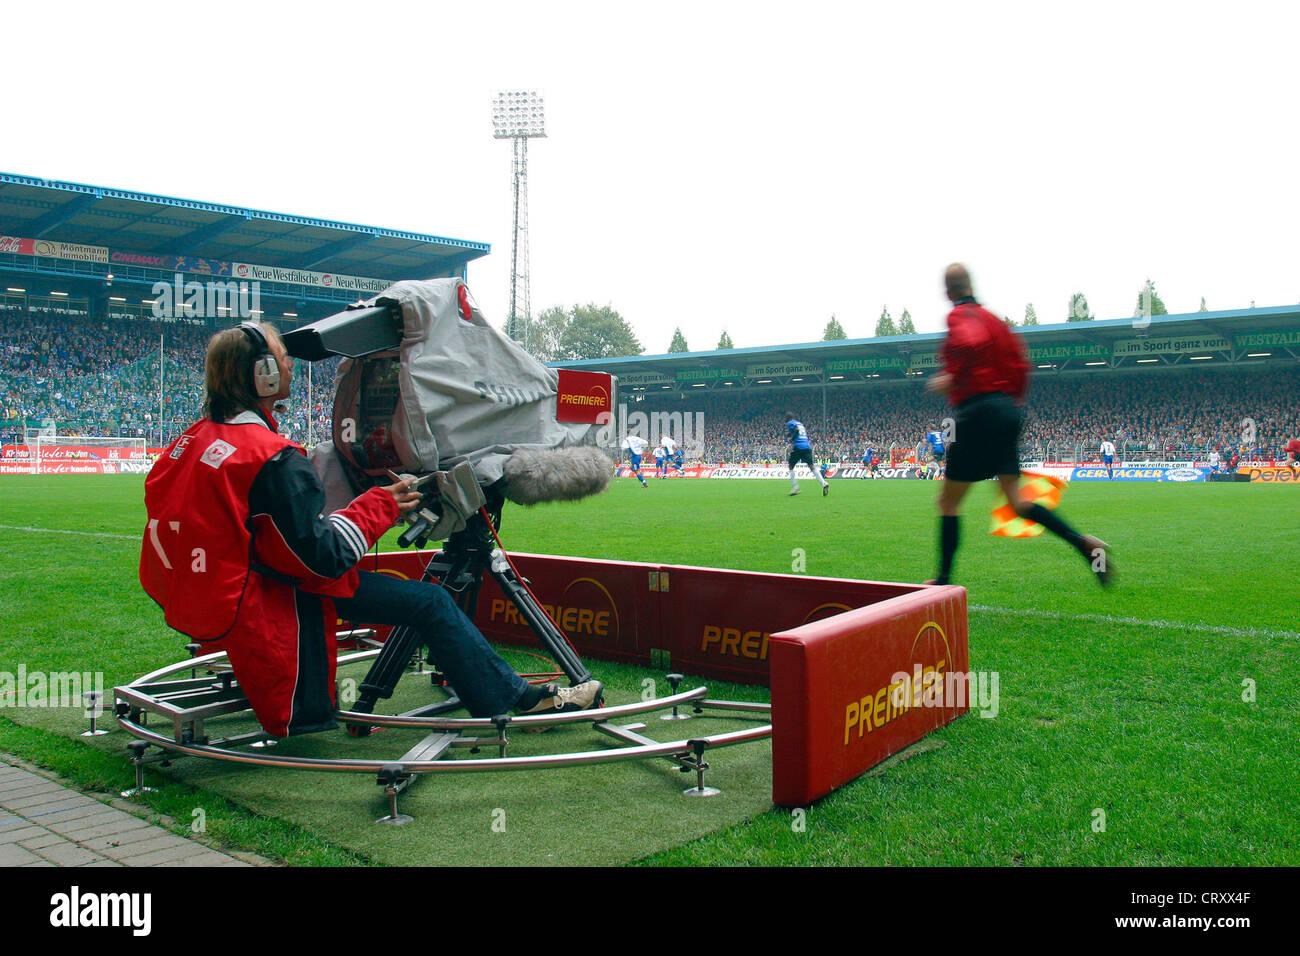 Bielefeld, PREMIERE camera when Bundesliga football match - Stock Image